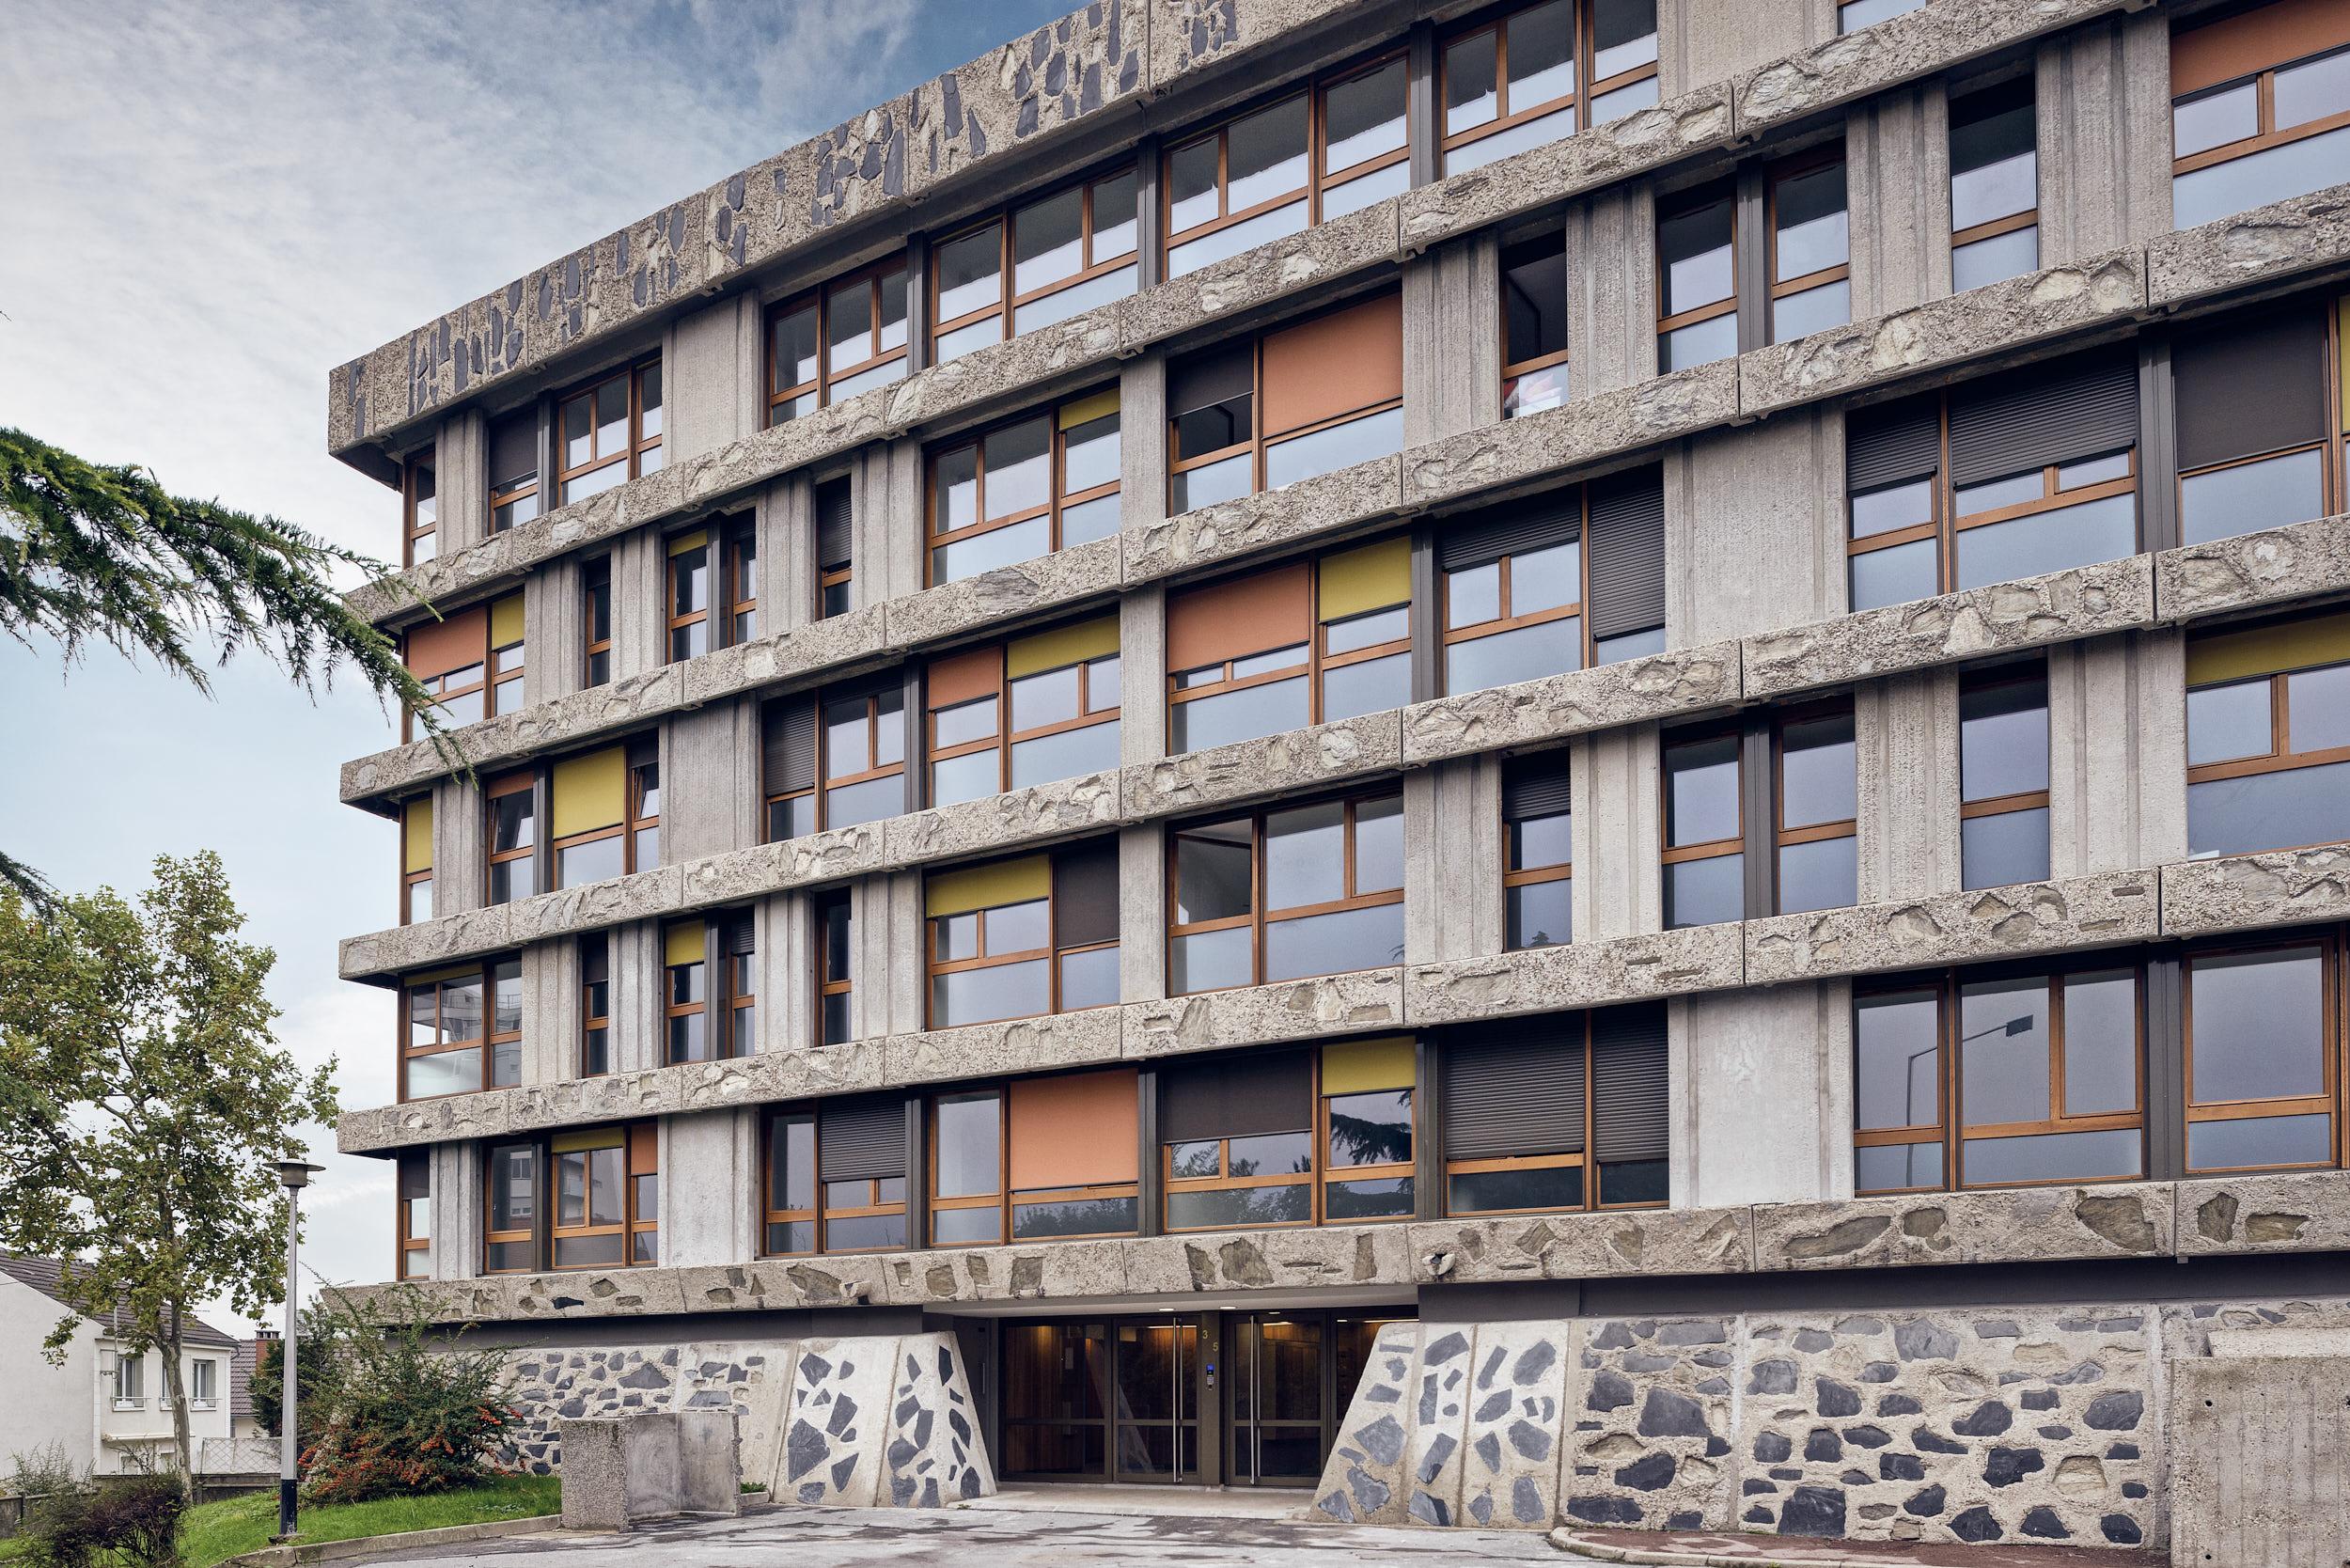 Paul Bossard - Agence RVA architectes